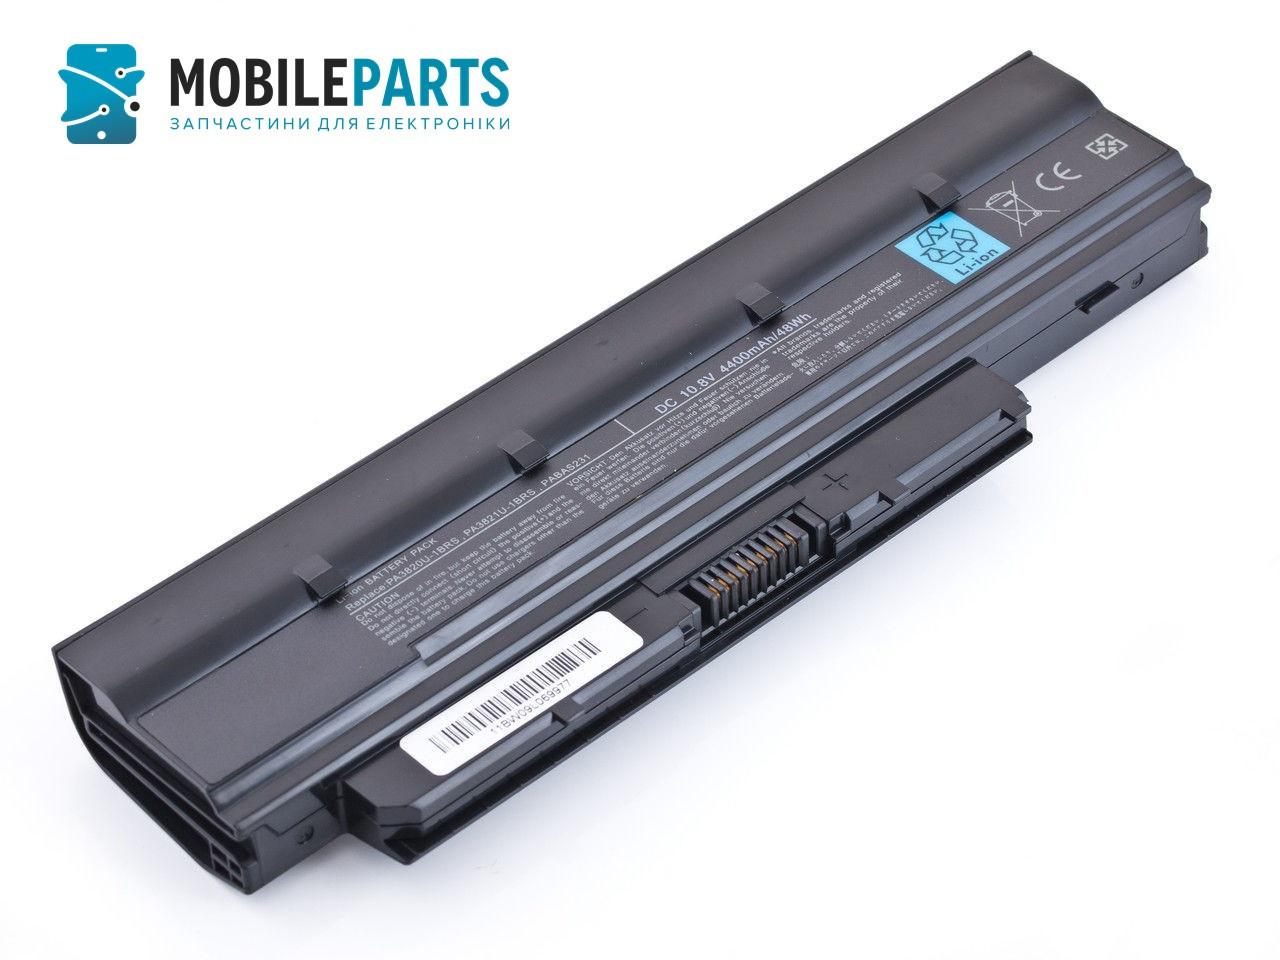 Аккумуляторная батарея Toshiba PA3820U-1BRS T210 T215 T230 T235 NB500 NB505 NB550 N300 N510